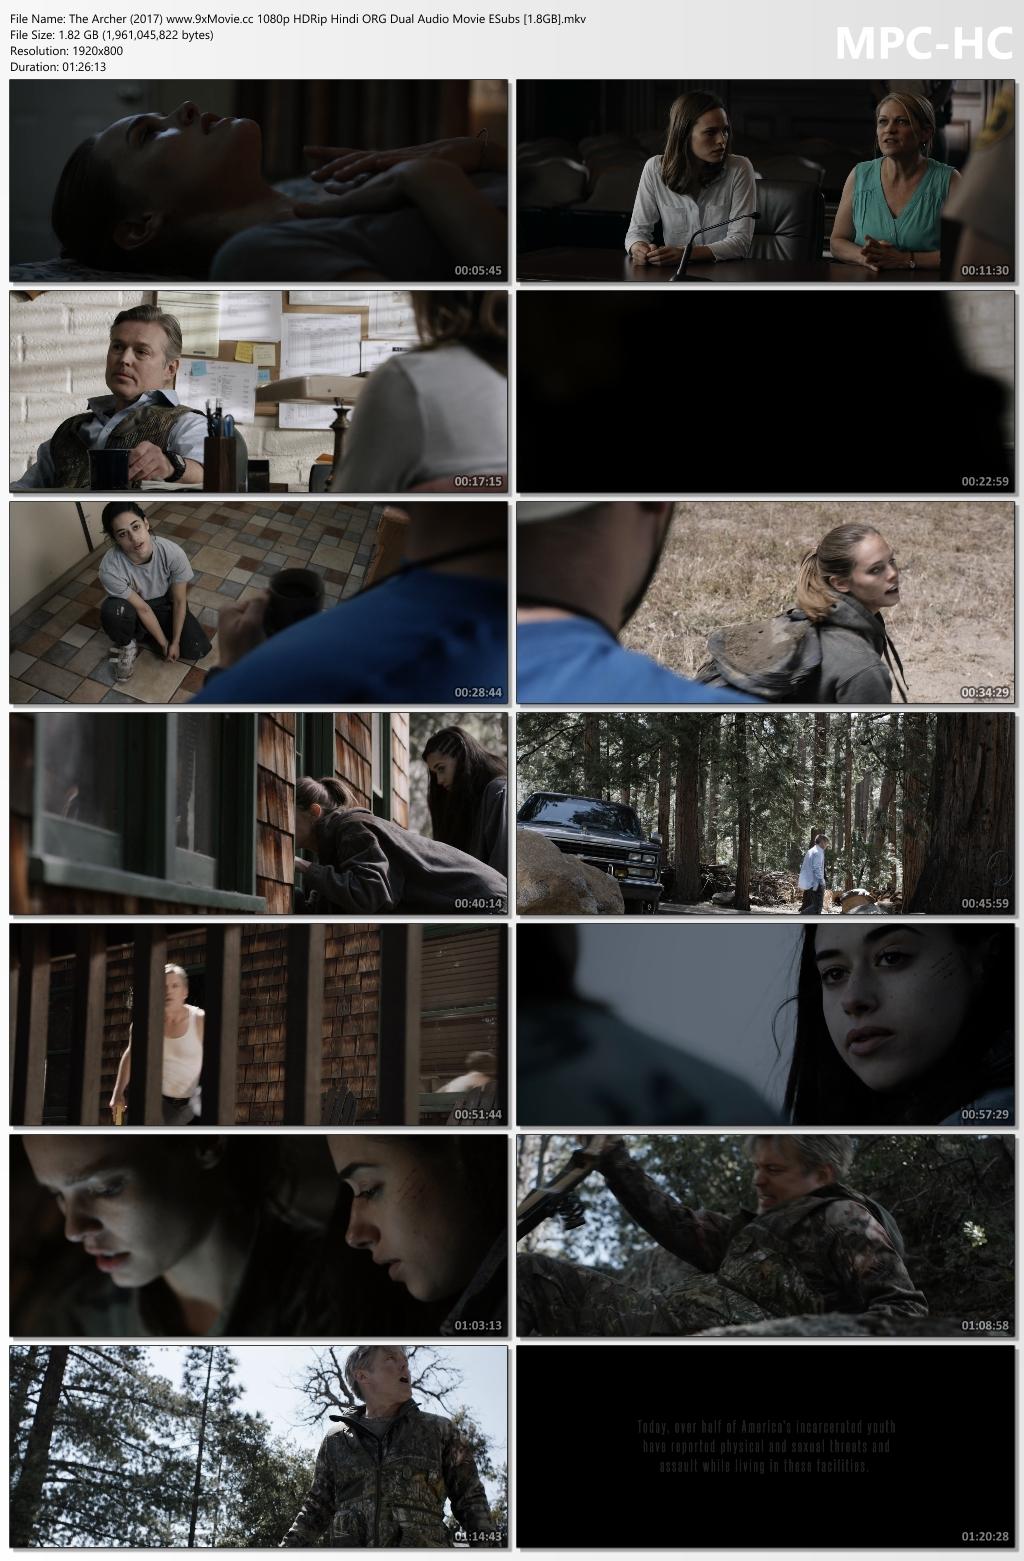 The-Archer-2017-www-9x-Movie-cc-1080p-HDRip-Hindi-ORG-Dual-Audio-Movie-ESubs-1-8-GB-mkv